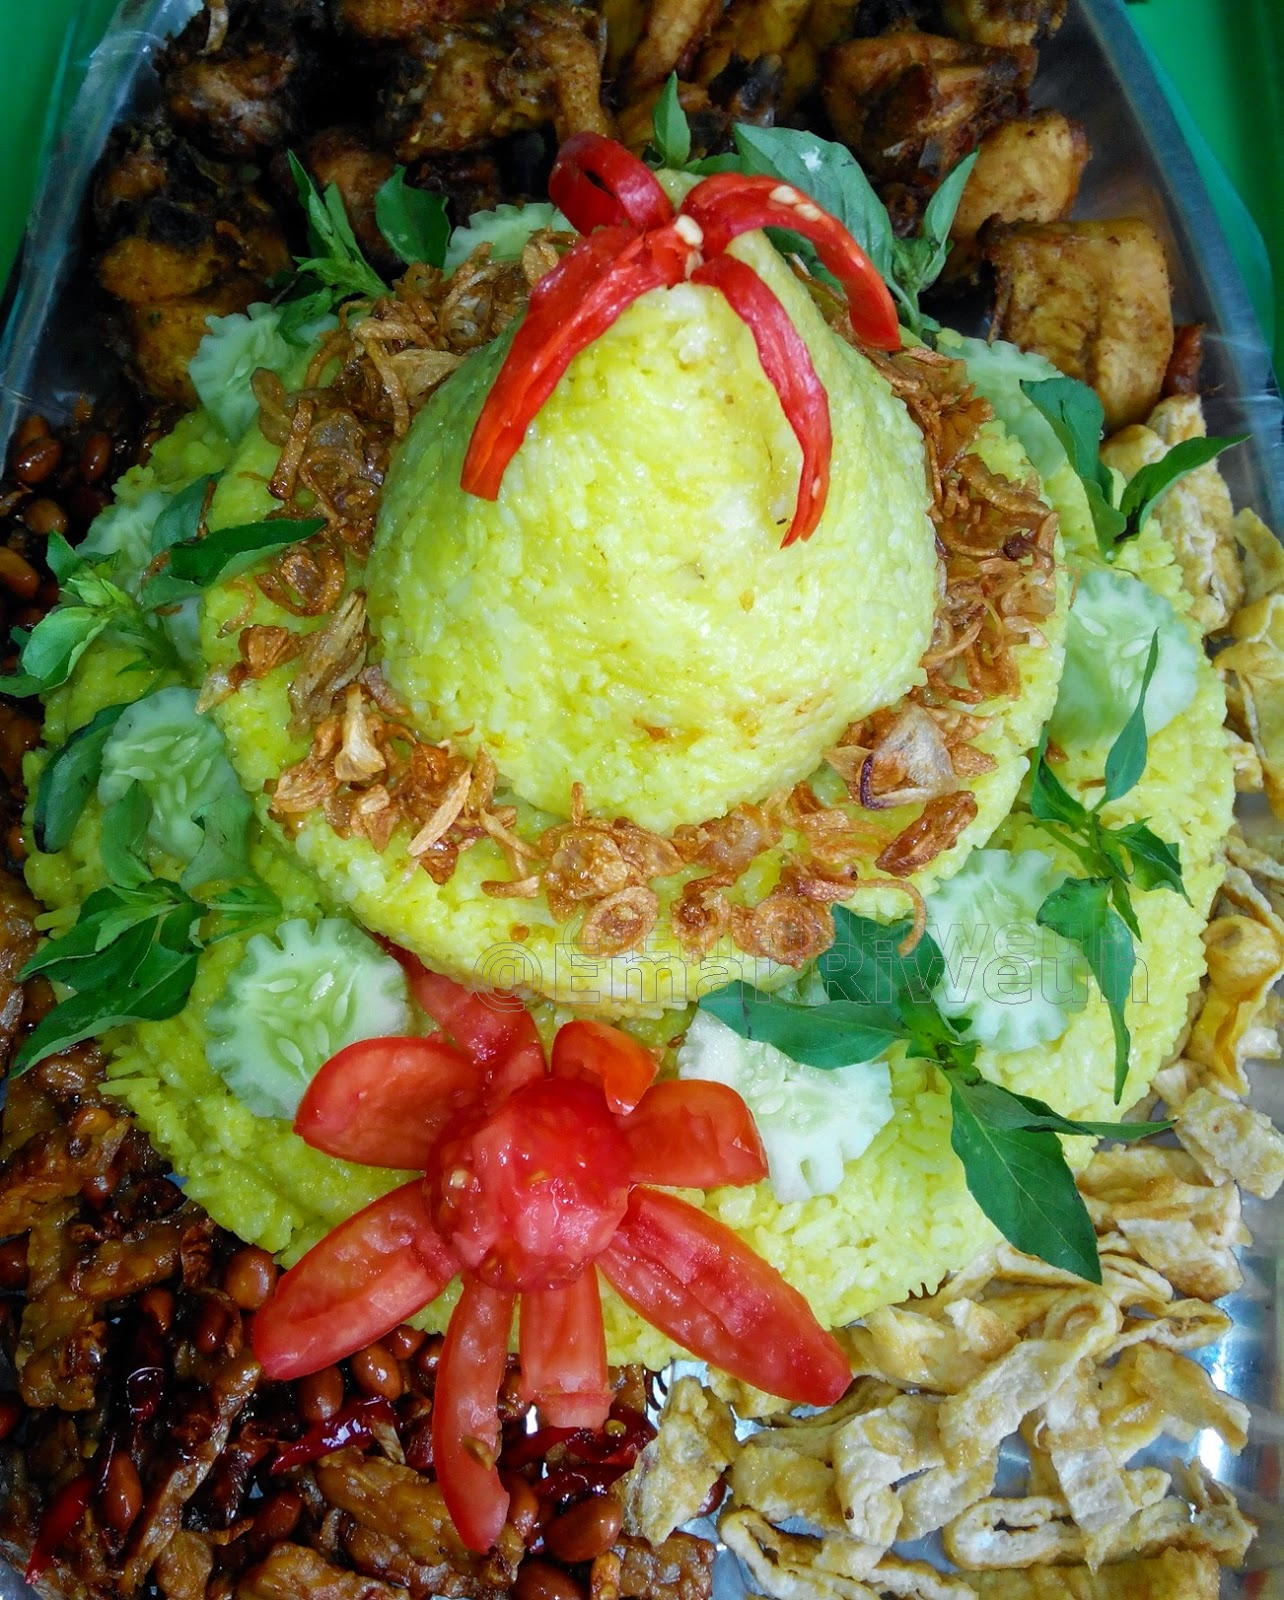 Resep Nasi Tumpeng : resep, tumpeng, Tumpeng, Sederhana, Dapur, Ngebut